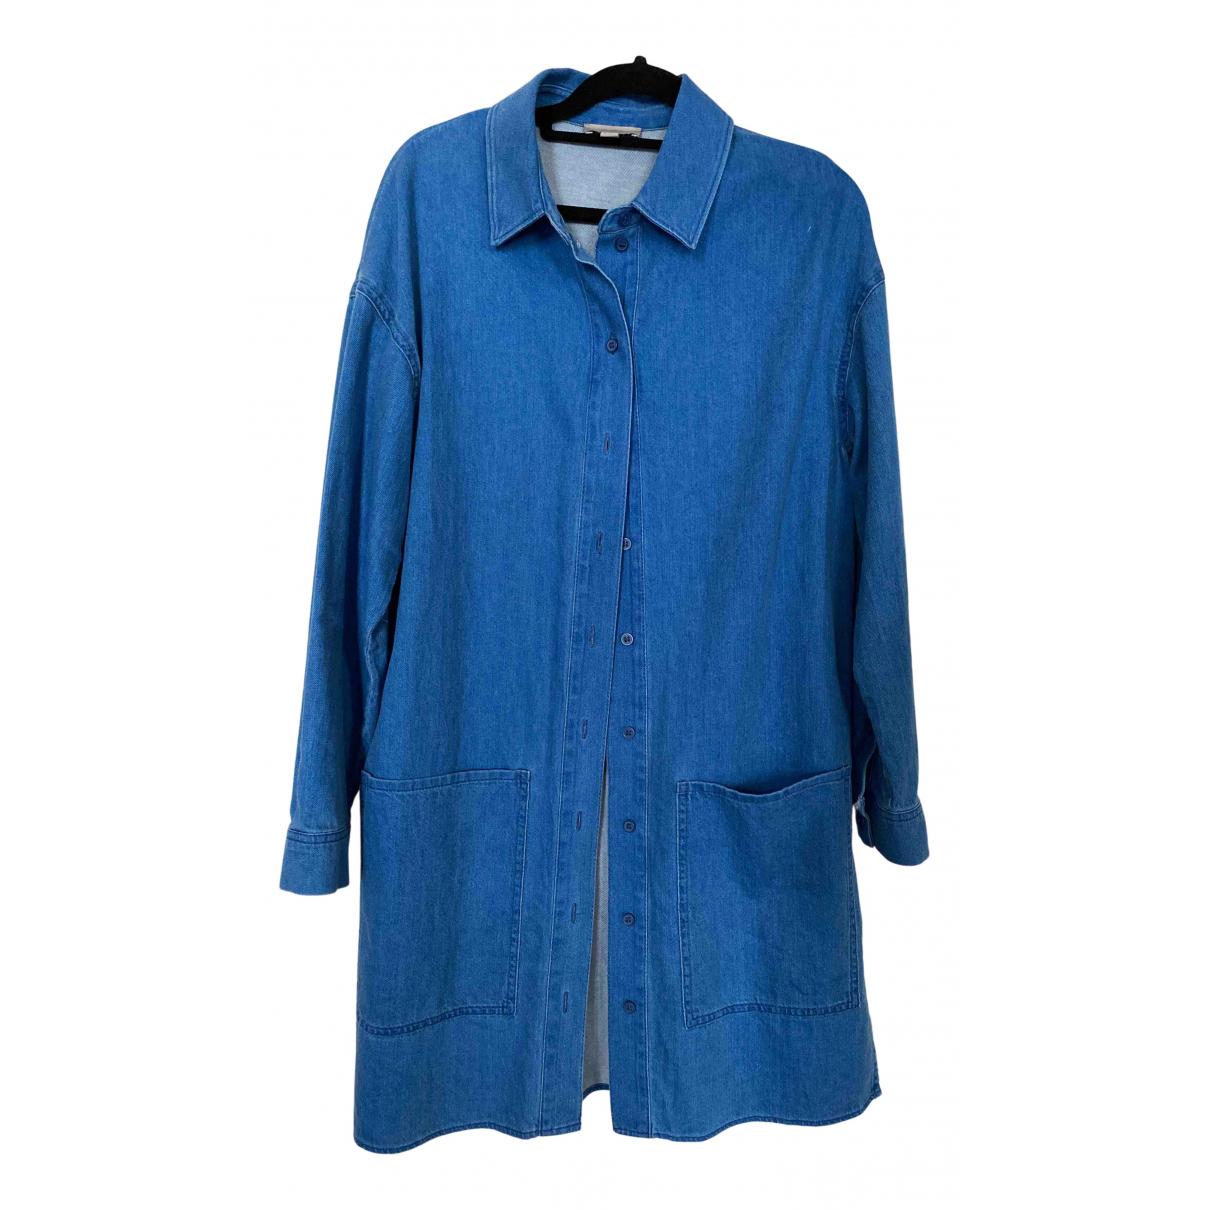 Cos N Blue Denim - Jeans  top for Women 34 FR